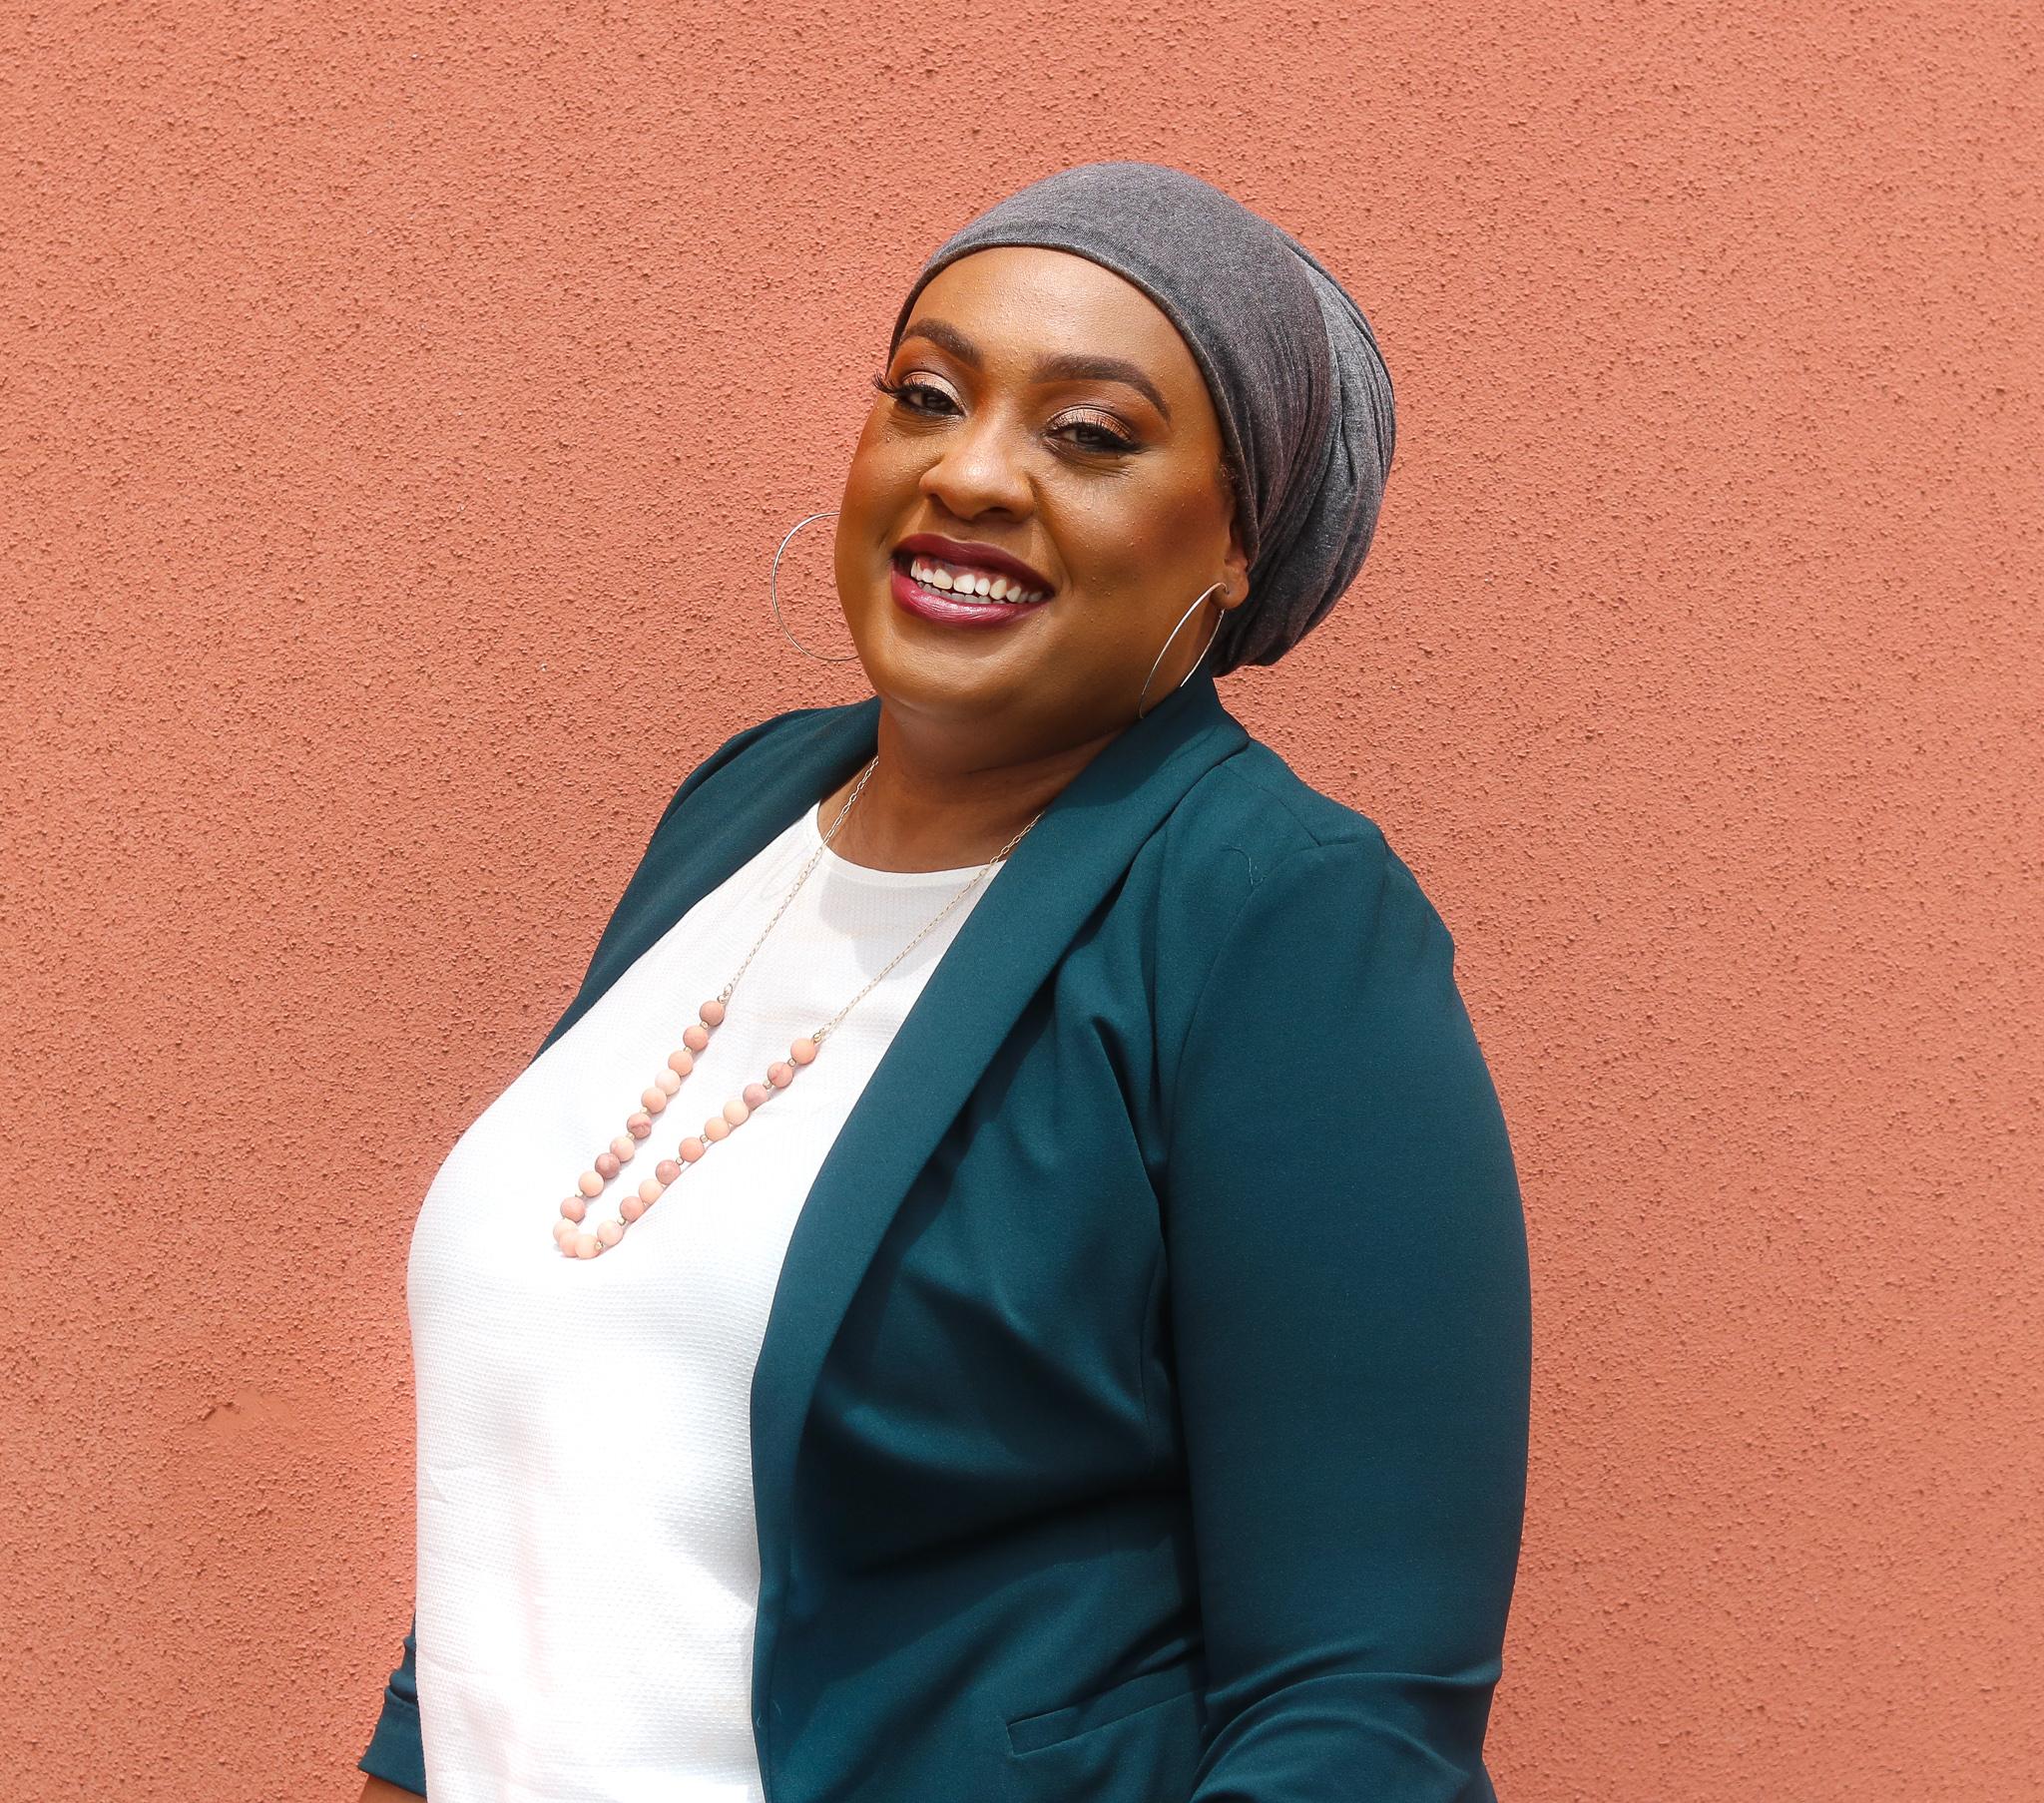 Kieta Mpolo Iriarte-Amin